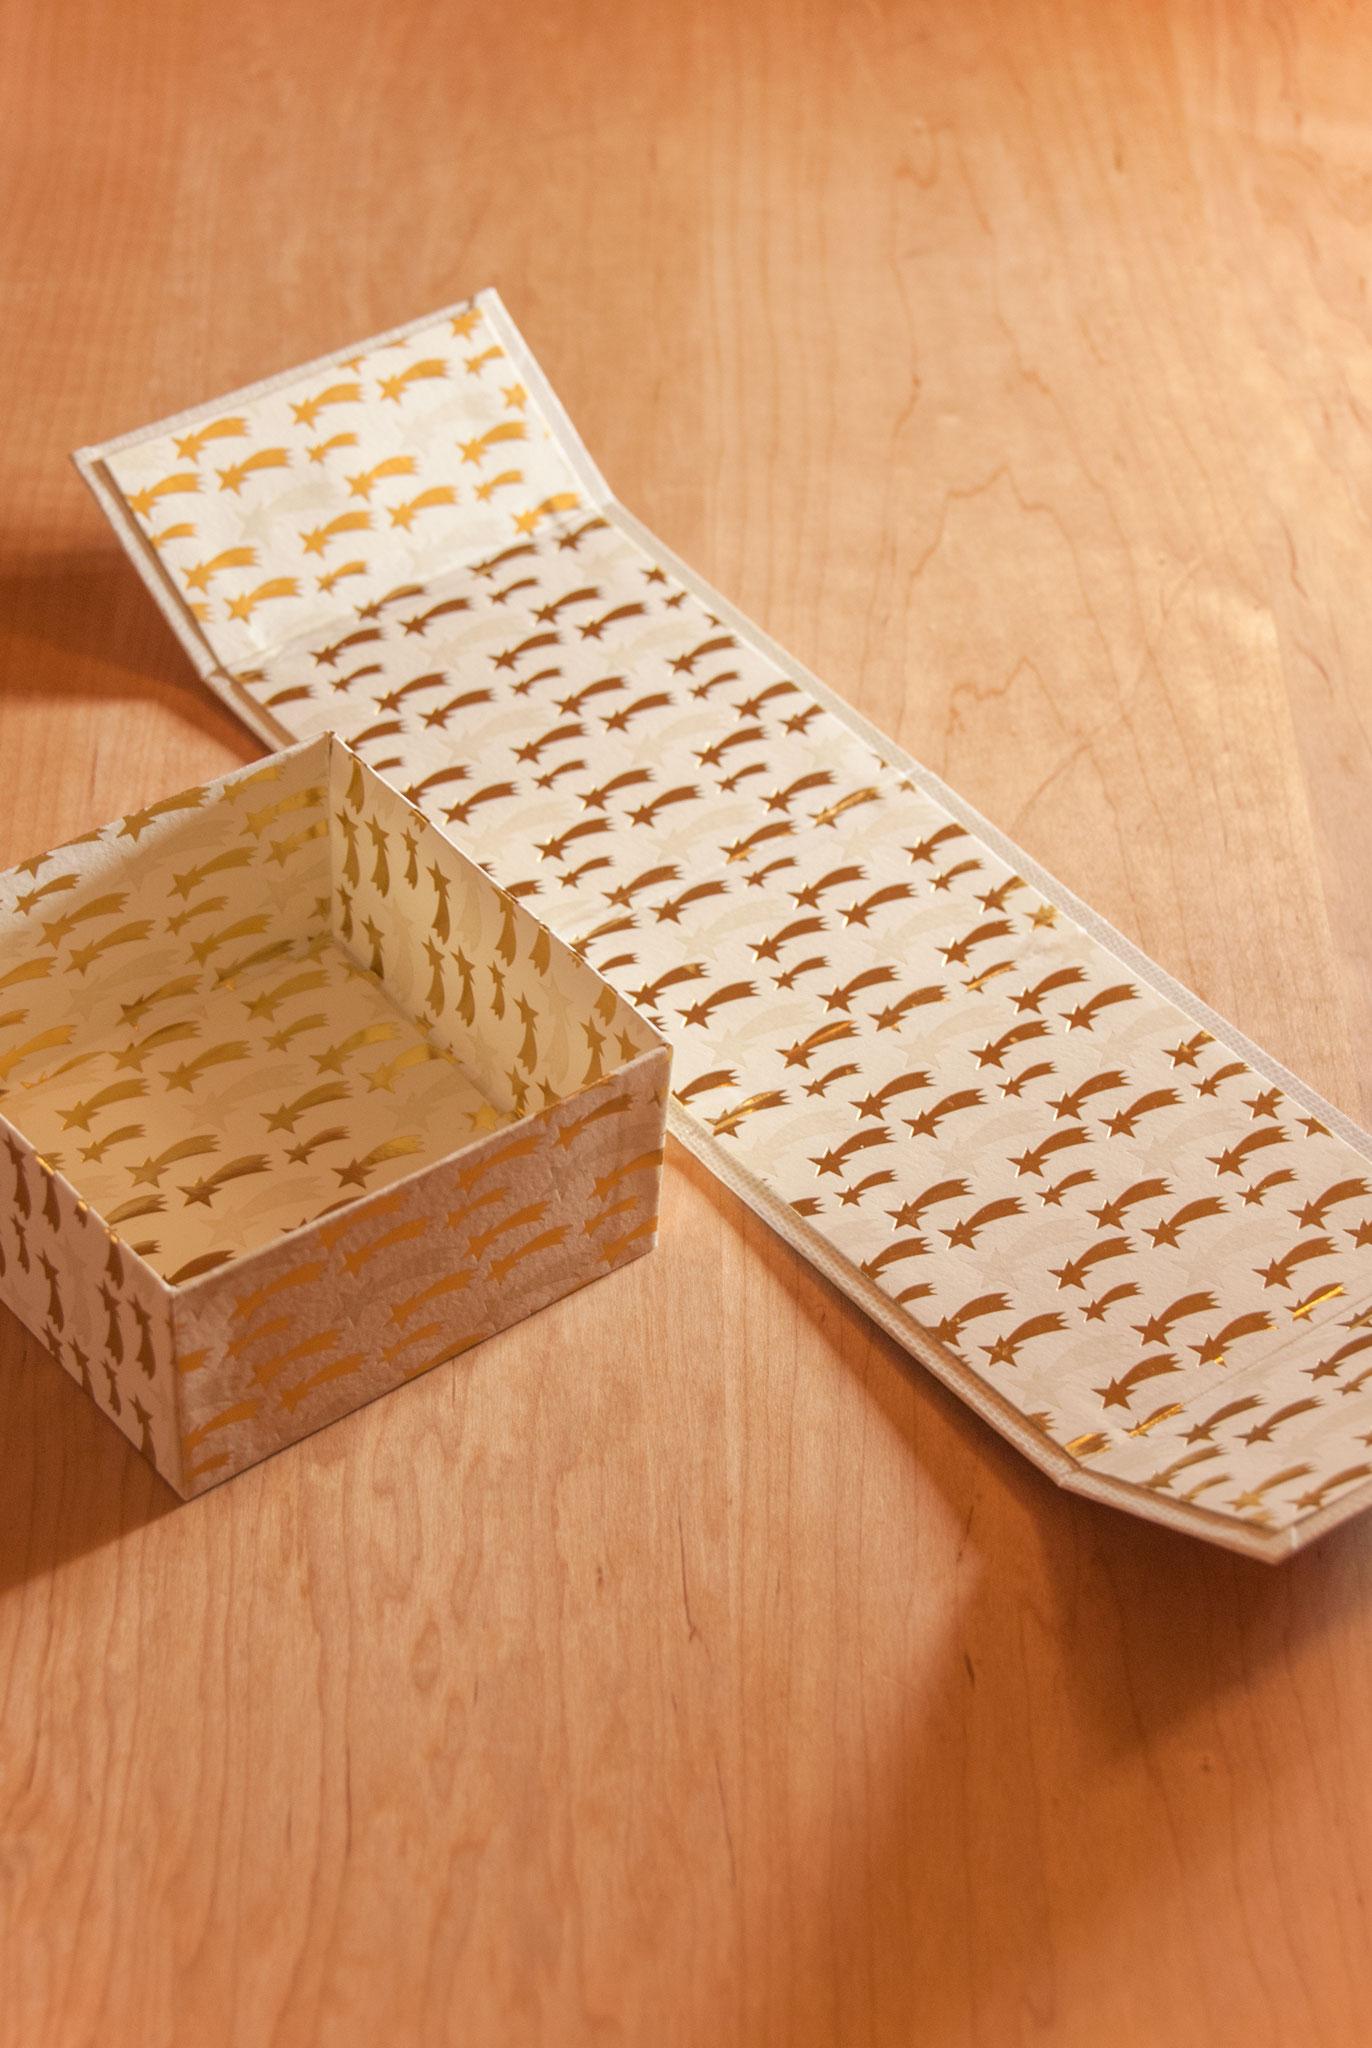 S(9.5-5) box with magnet, full lining, Fleur*Fleur*